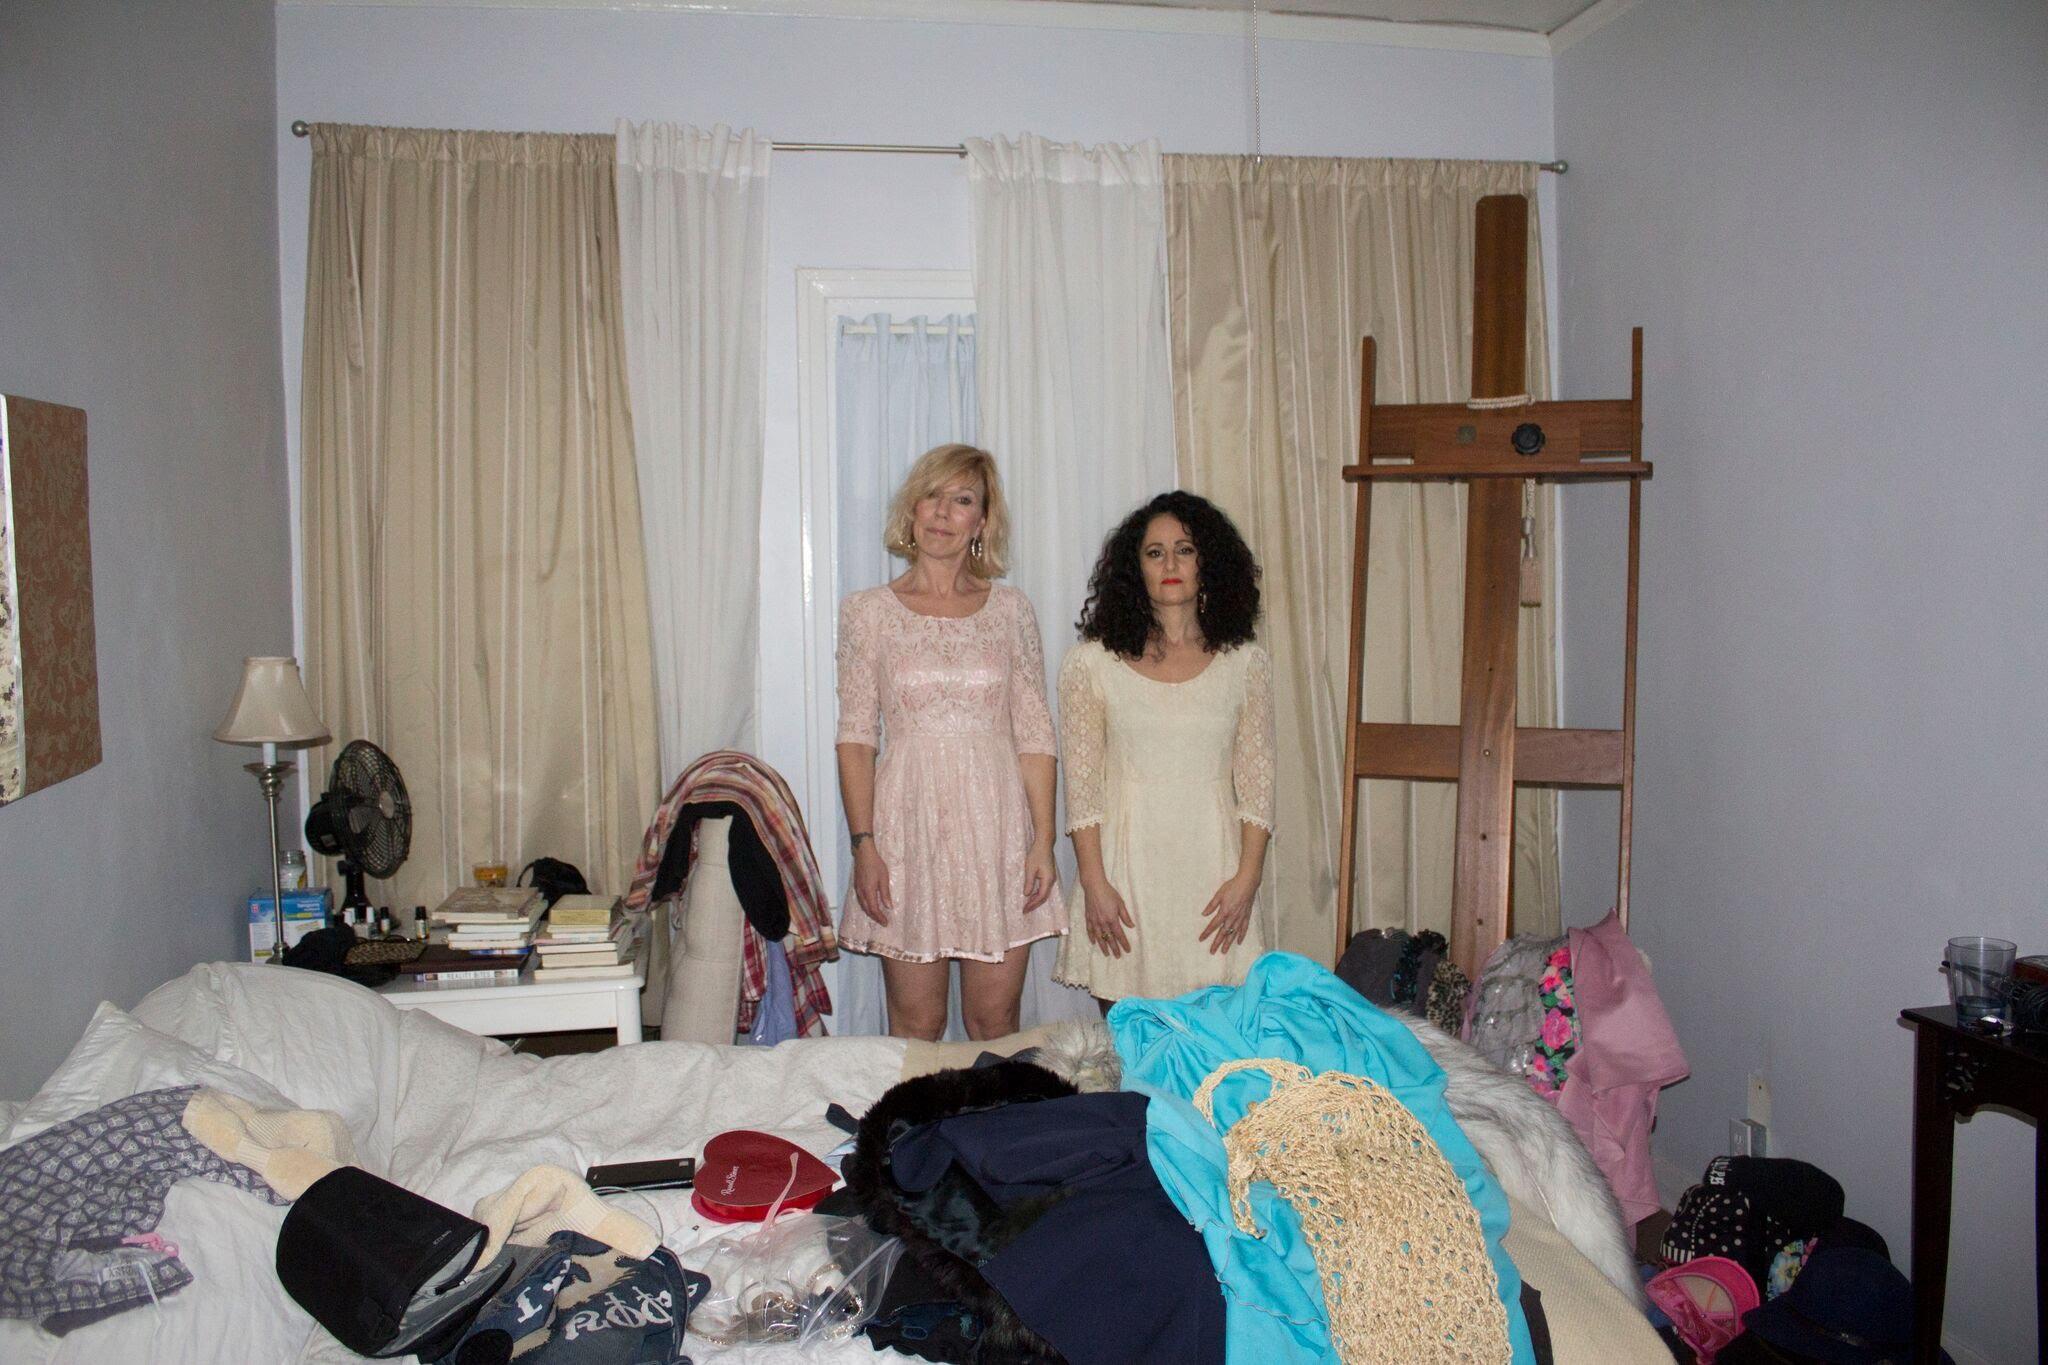 Kate Capshaw,Hayley Erin Hot tube Sue Costello,Haylynn Cohen USA 1 2000